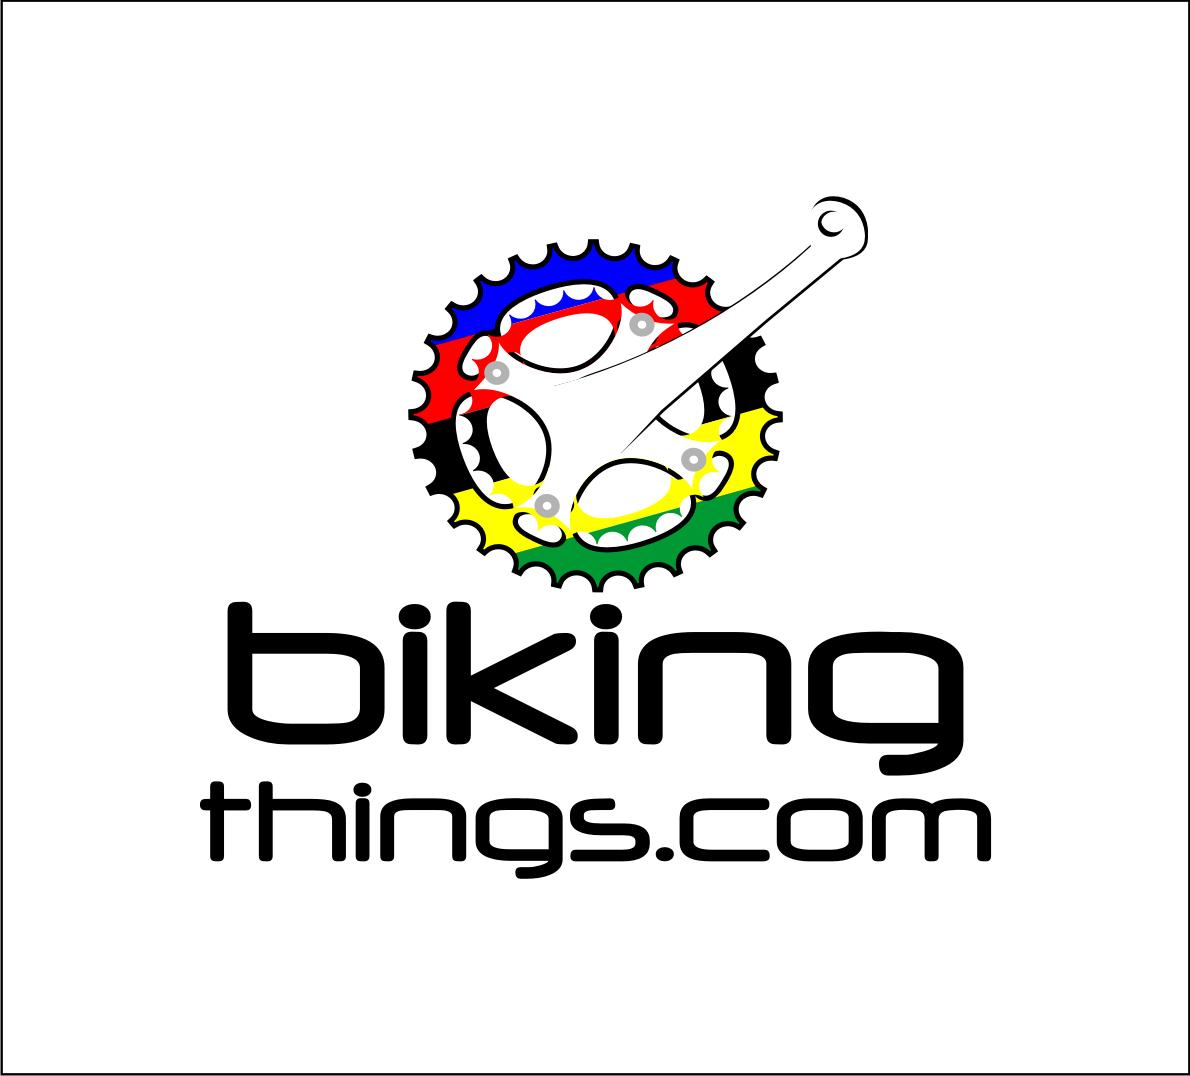 cyclingthings bikingthings